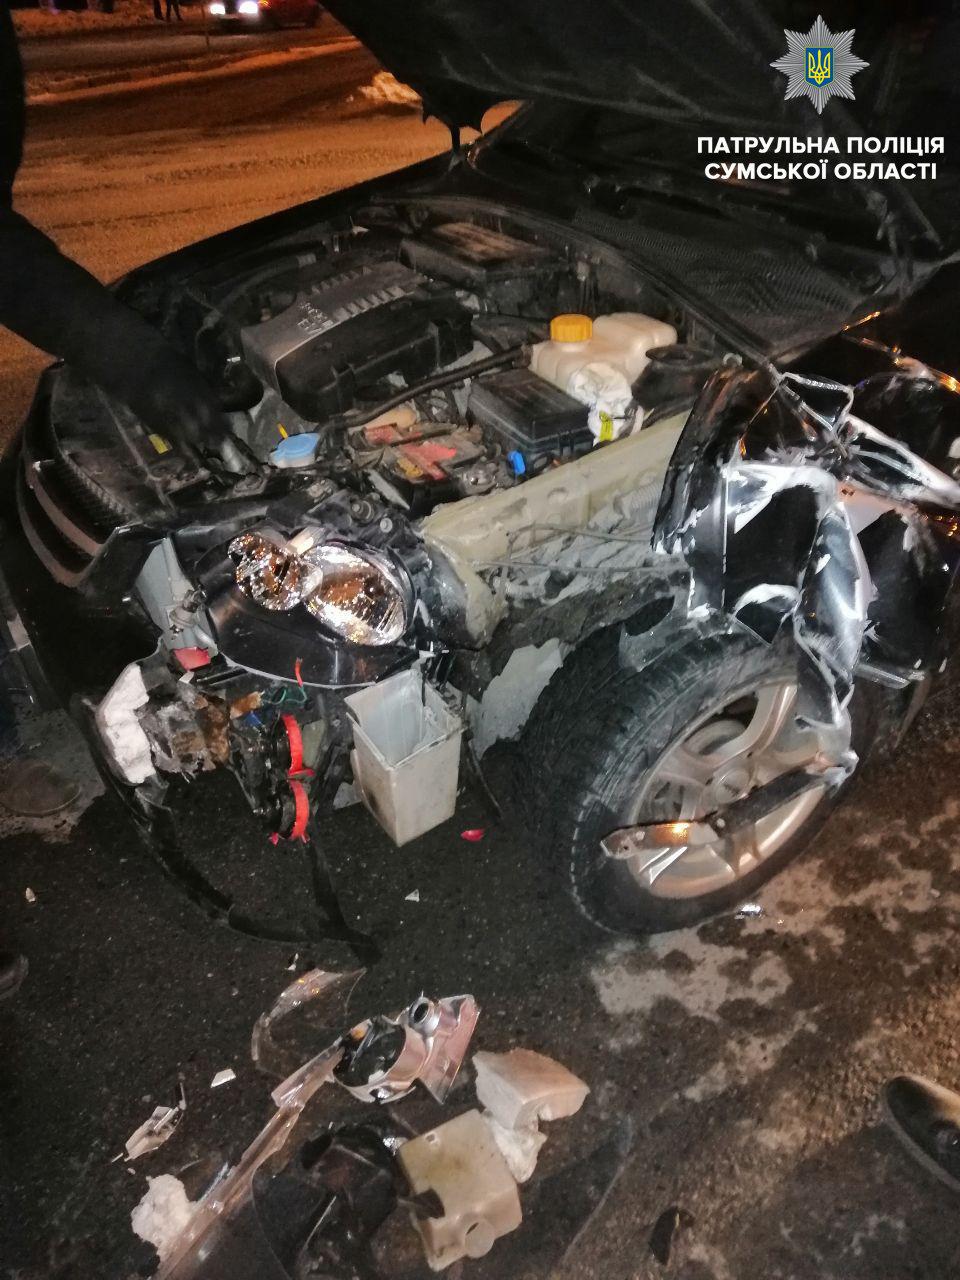 В центре Сум по вине пьяного водителя произошло ДТП, фото-1